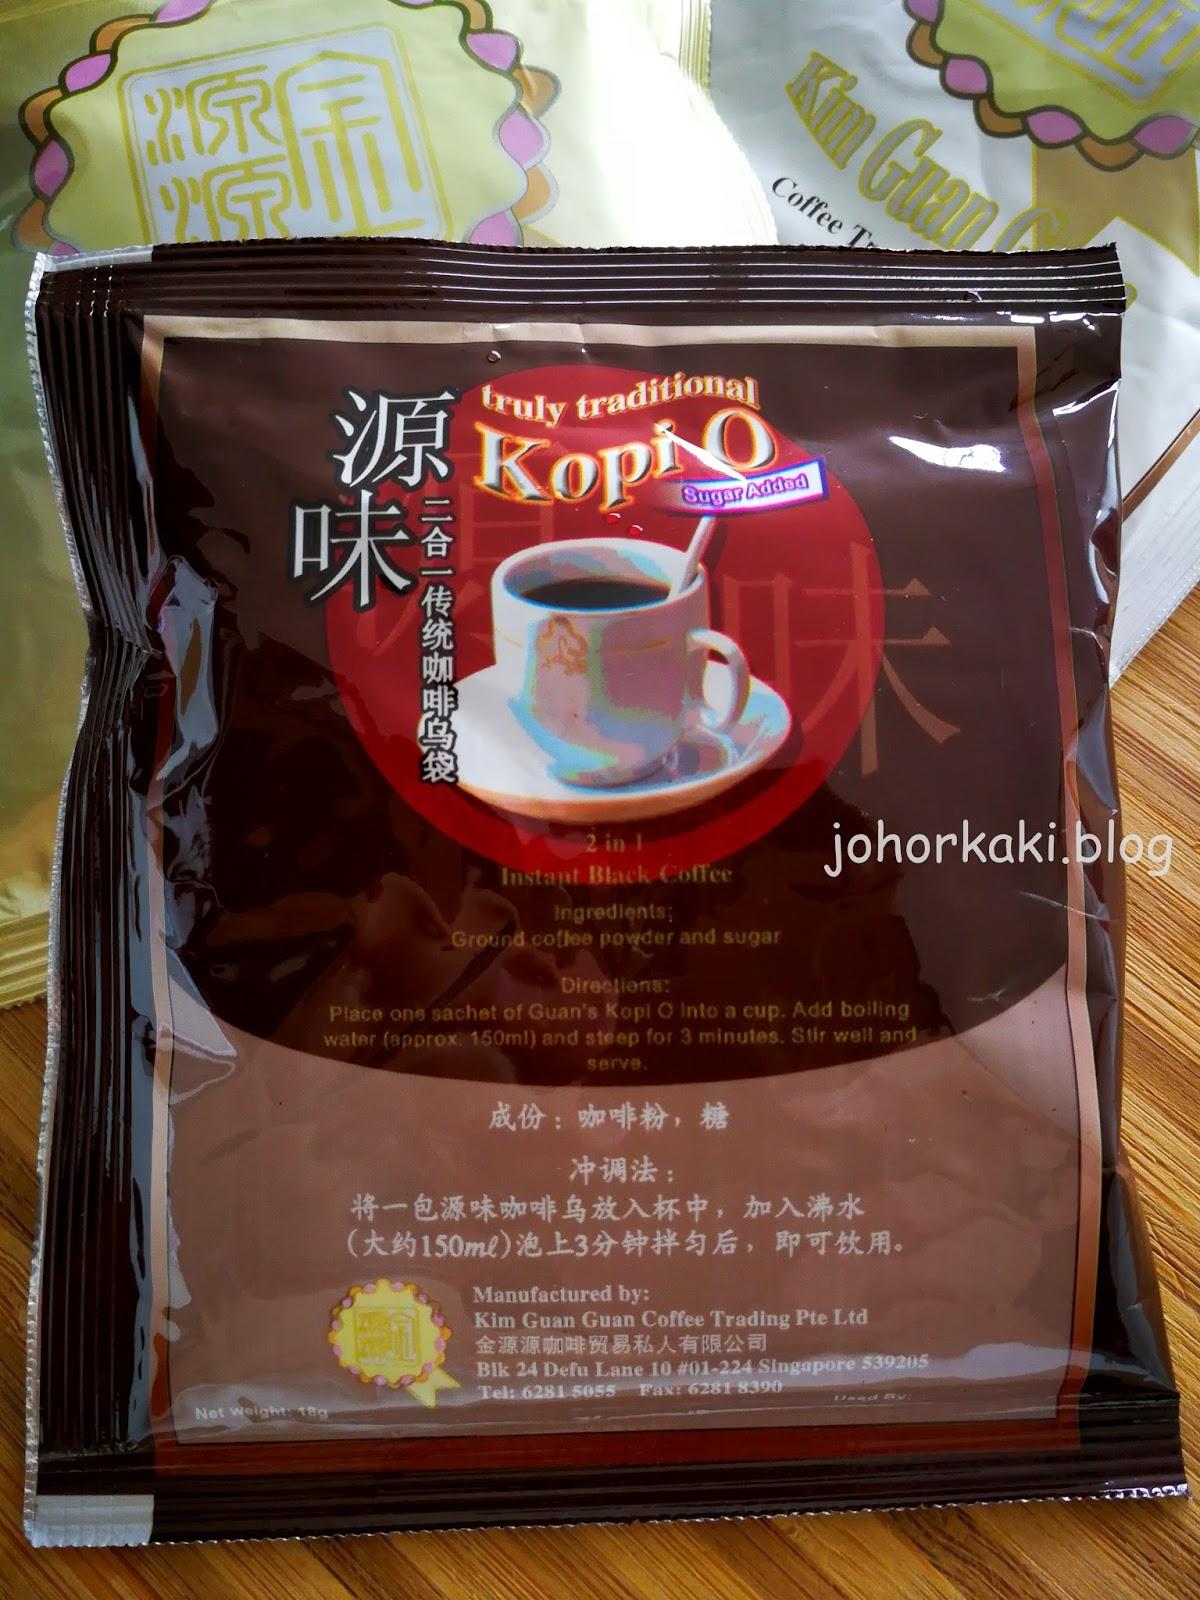 Kim Guan Guan Coffee Trading Pte Ltd - Home | Facebook